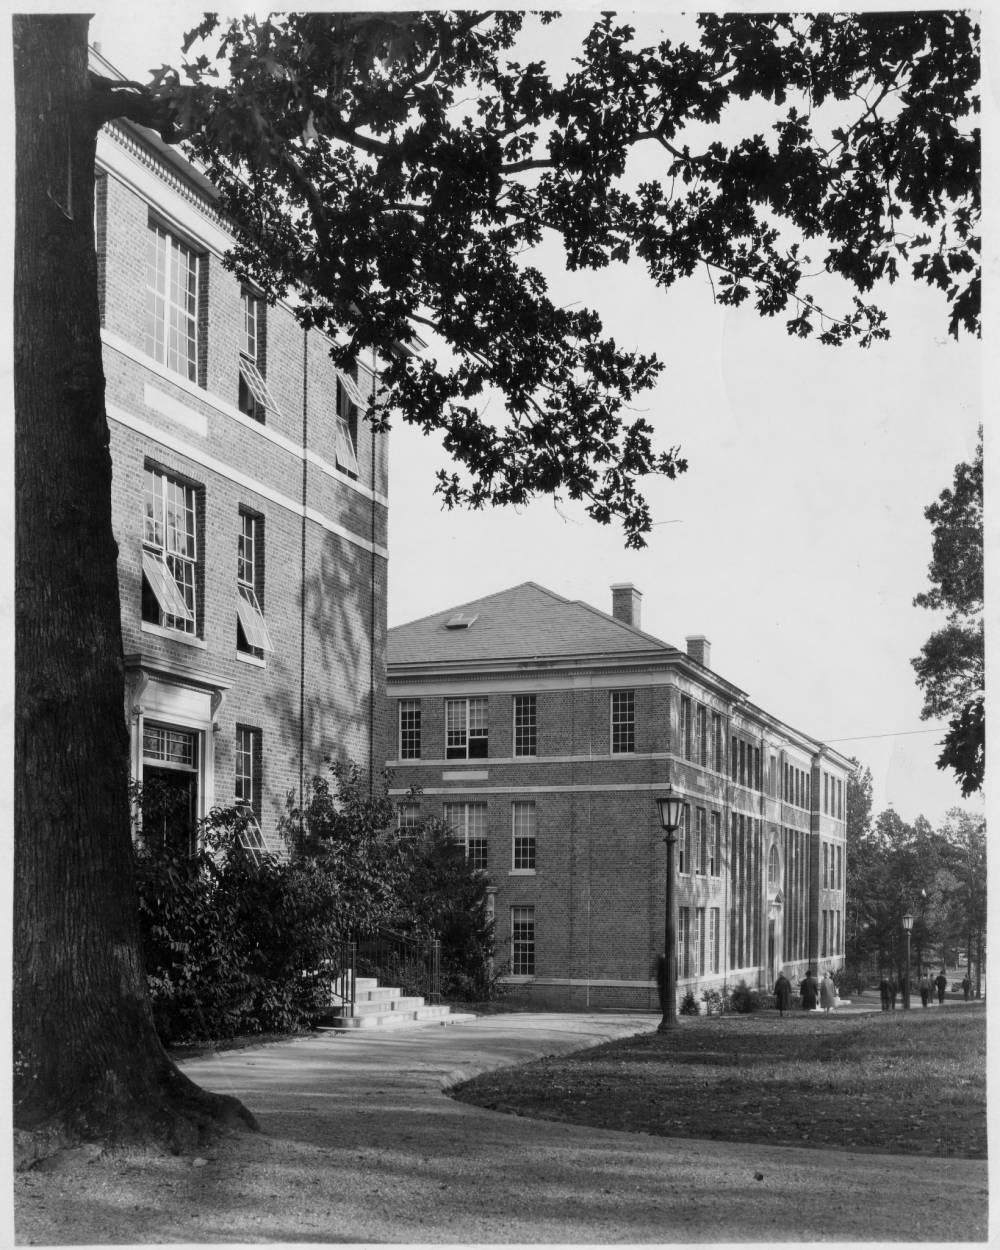 Historical Photo of Bingham Hall